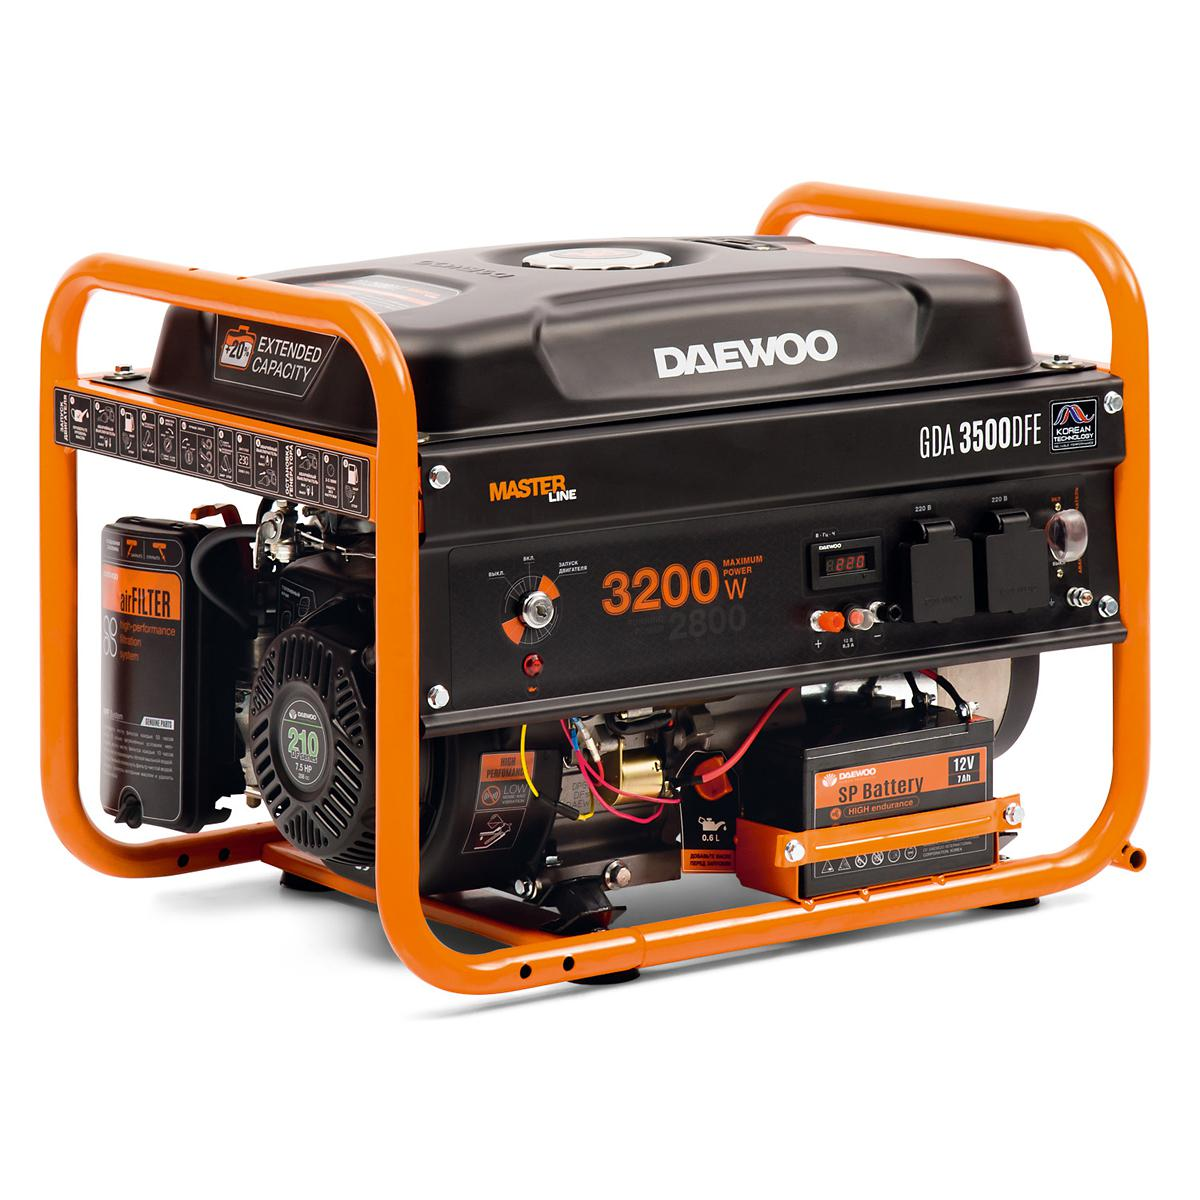 Генератор Daewoo Gda 3500 dfe бензиновый генератор daewoo gda 4800i